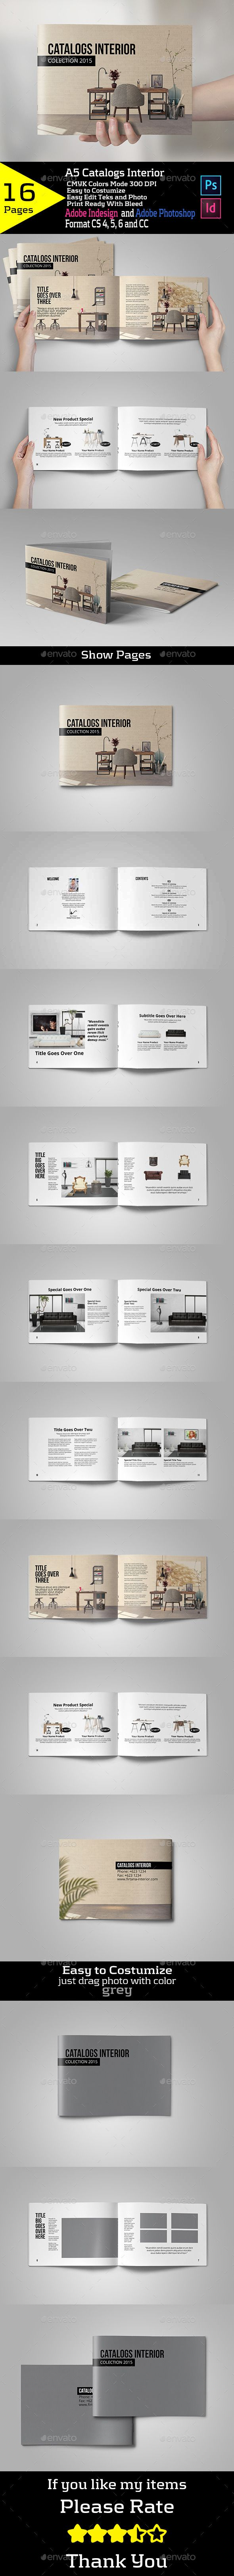 Catalogs Interior - Brochures Print Templates